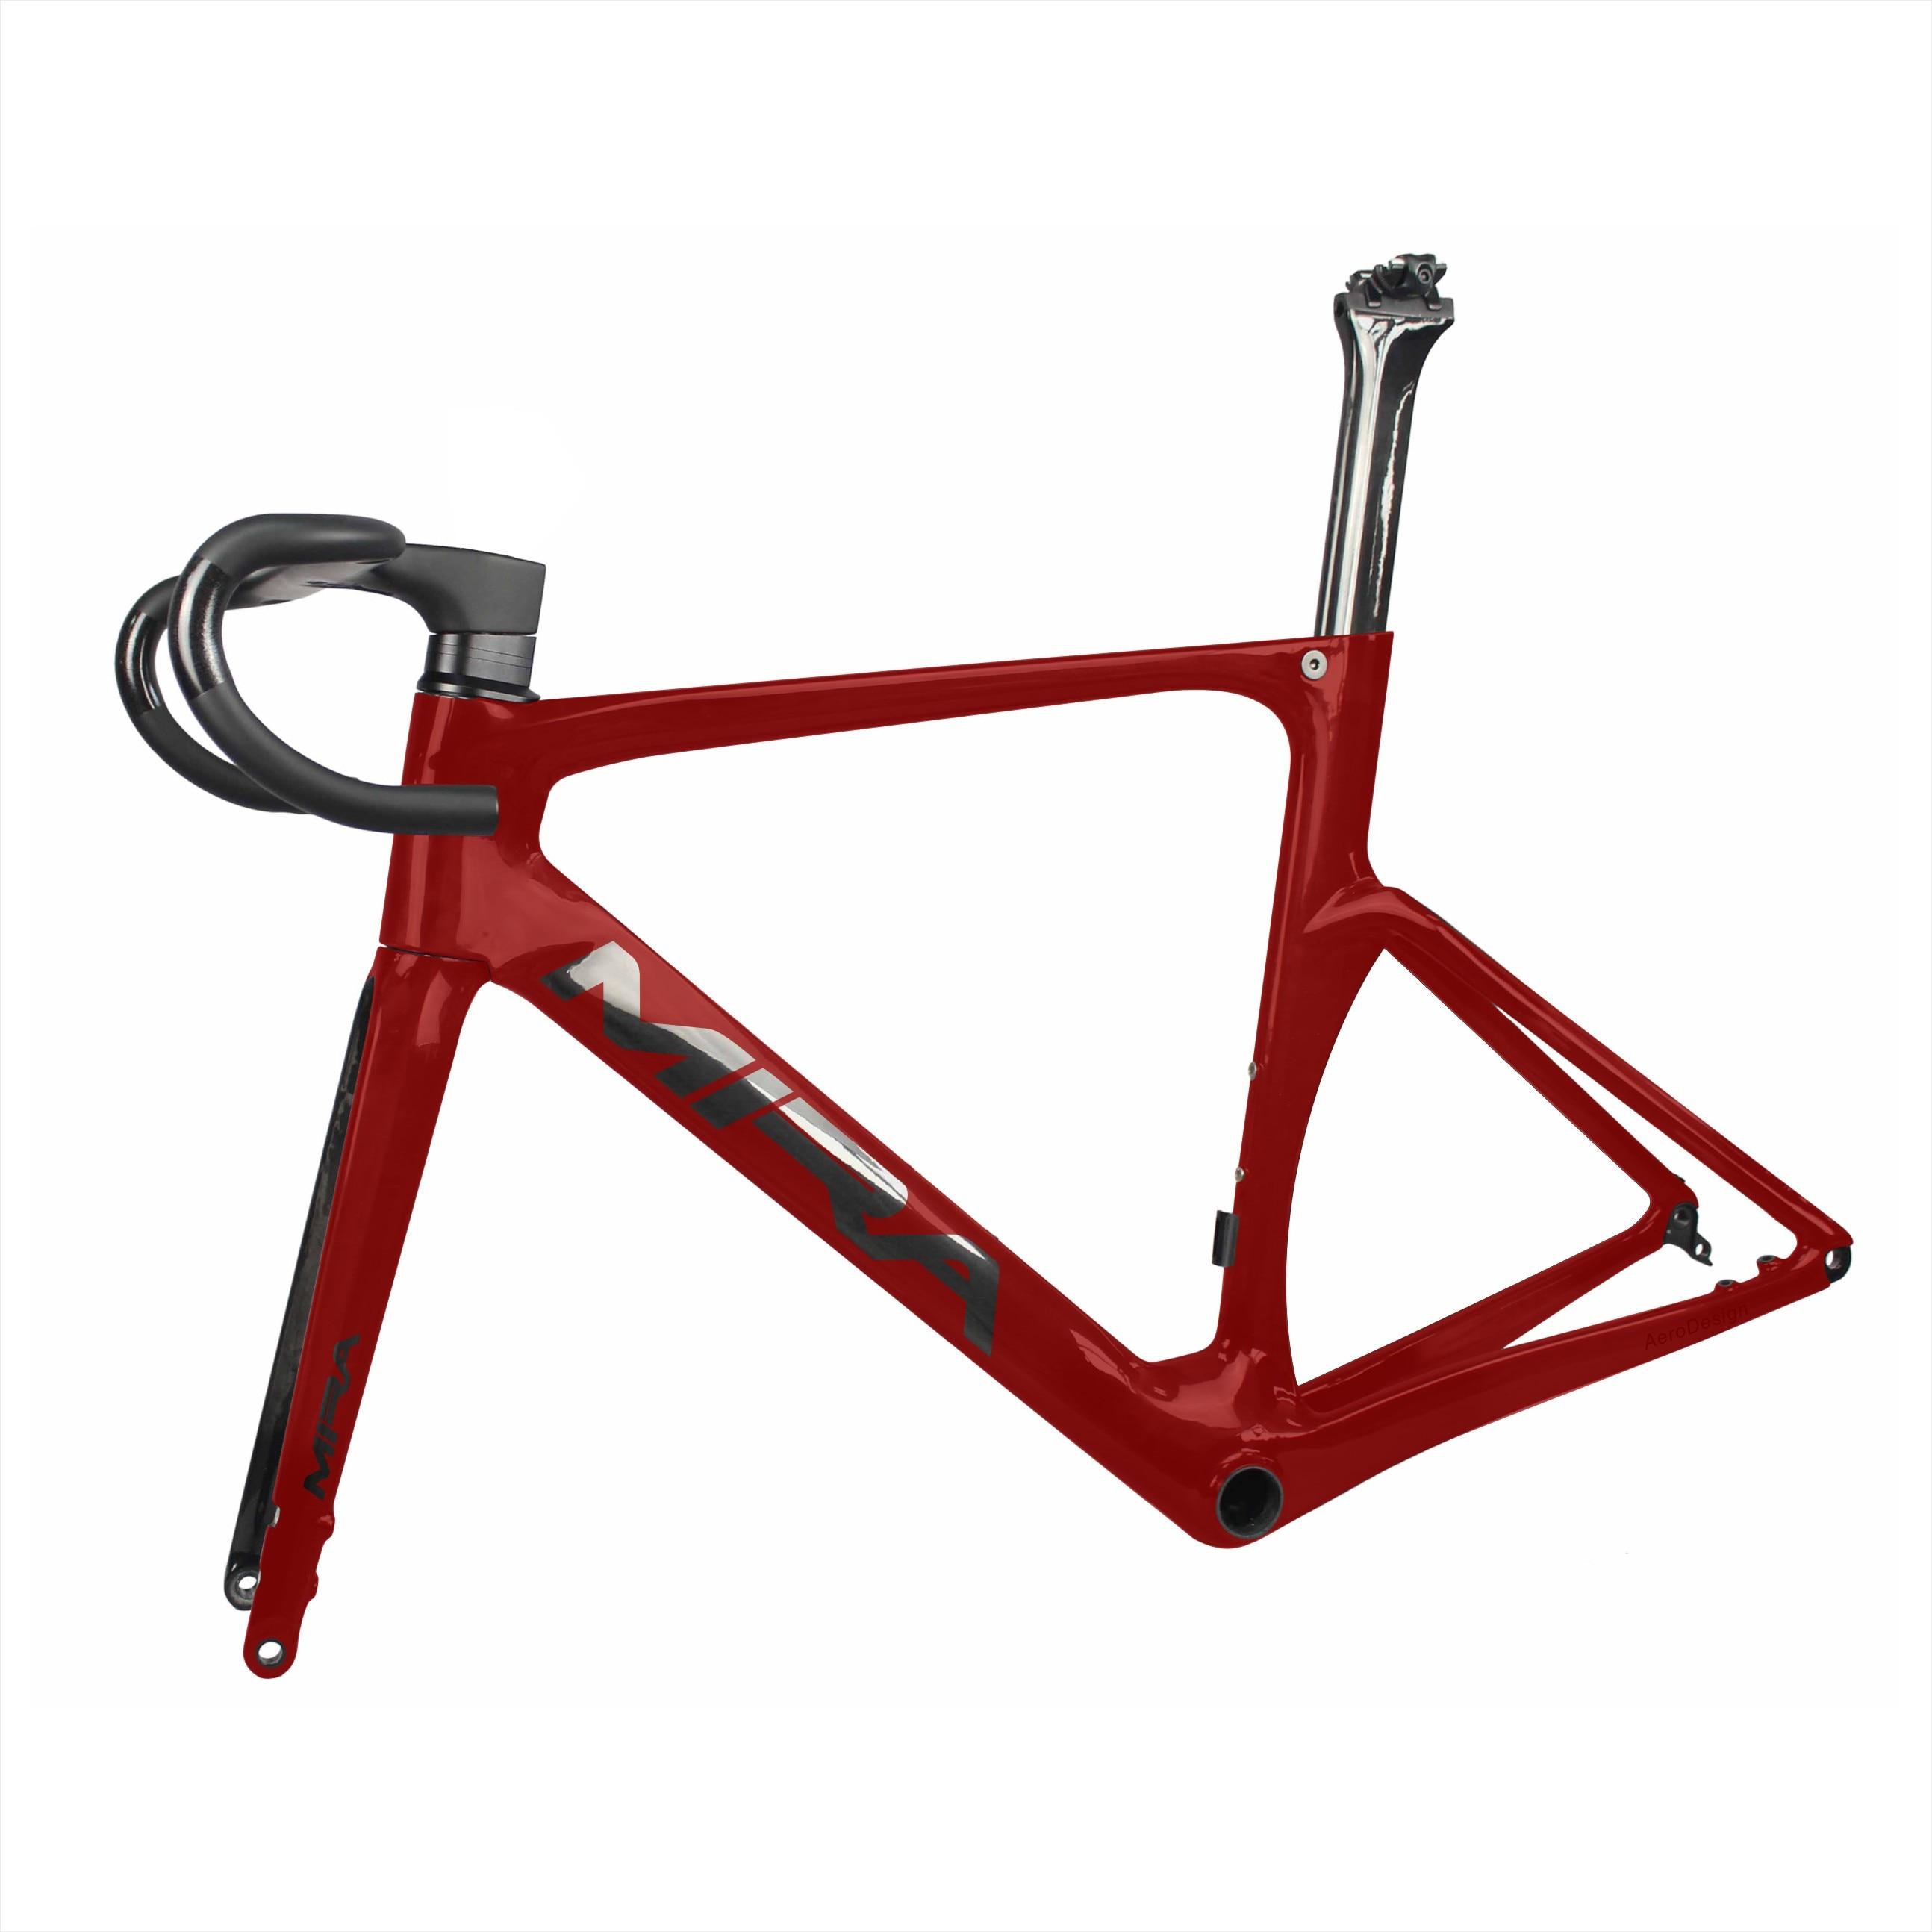 High Quality Carbon Disc Road Bike Frame,T700 Full Carbon Bicycle Frame,AERO  Flat Mount Disc Road Bike Frame China